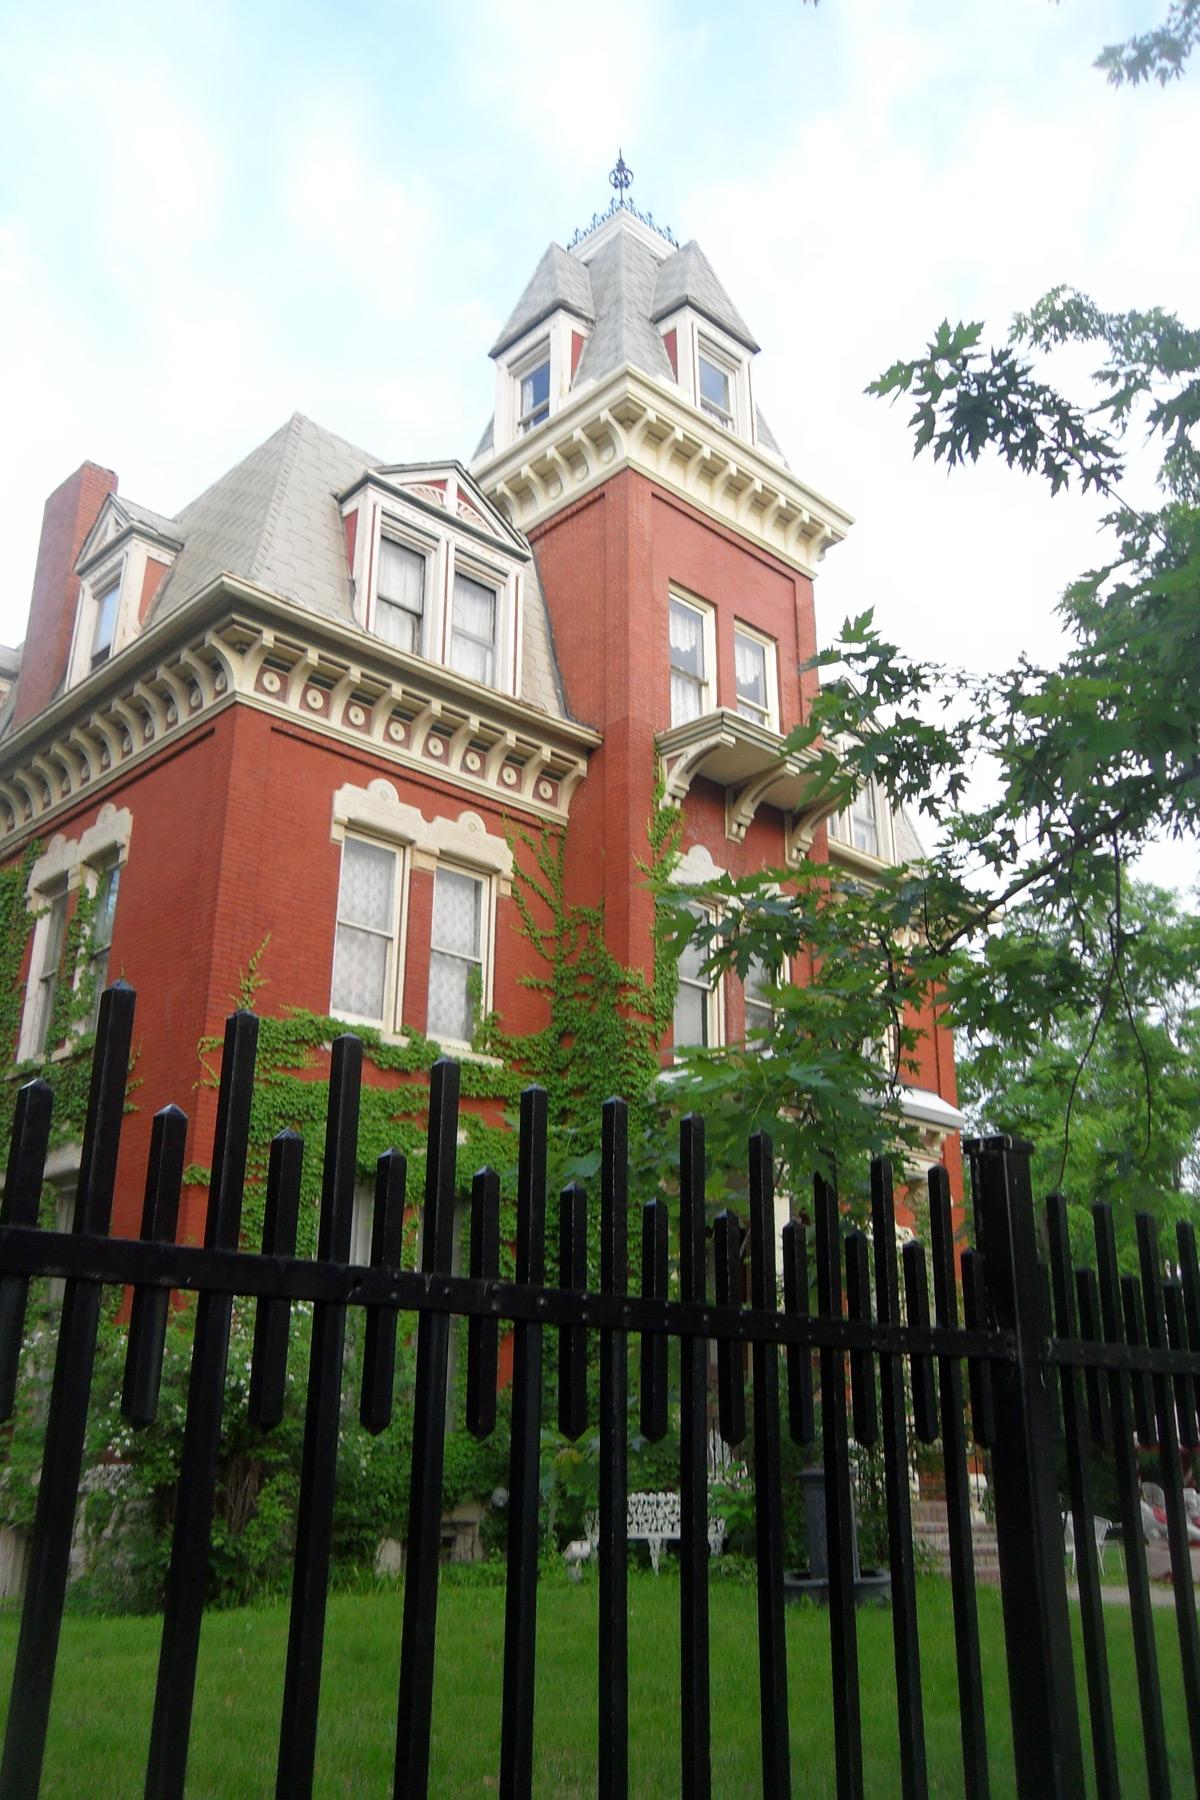 Haunted Hiram Scutt Mansion Sold in a Week in a Bidding War